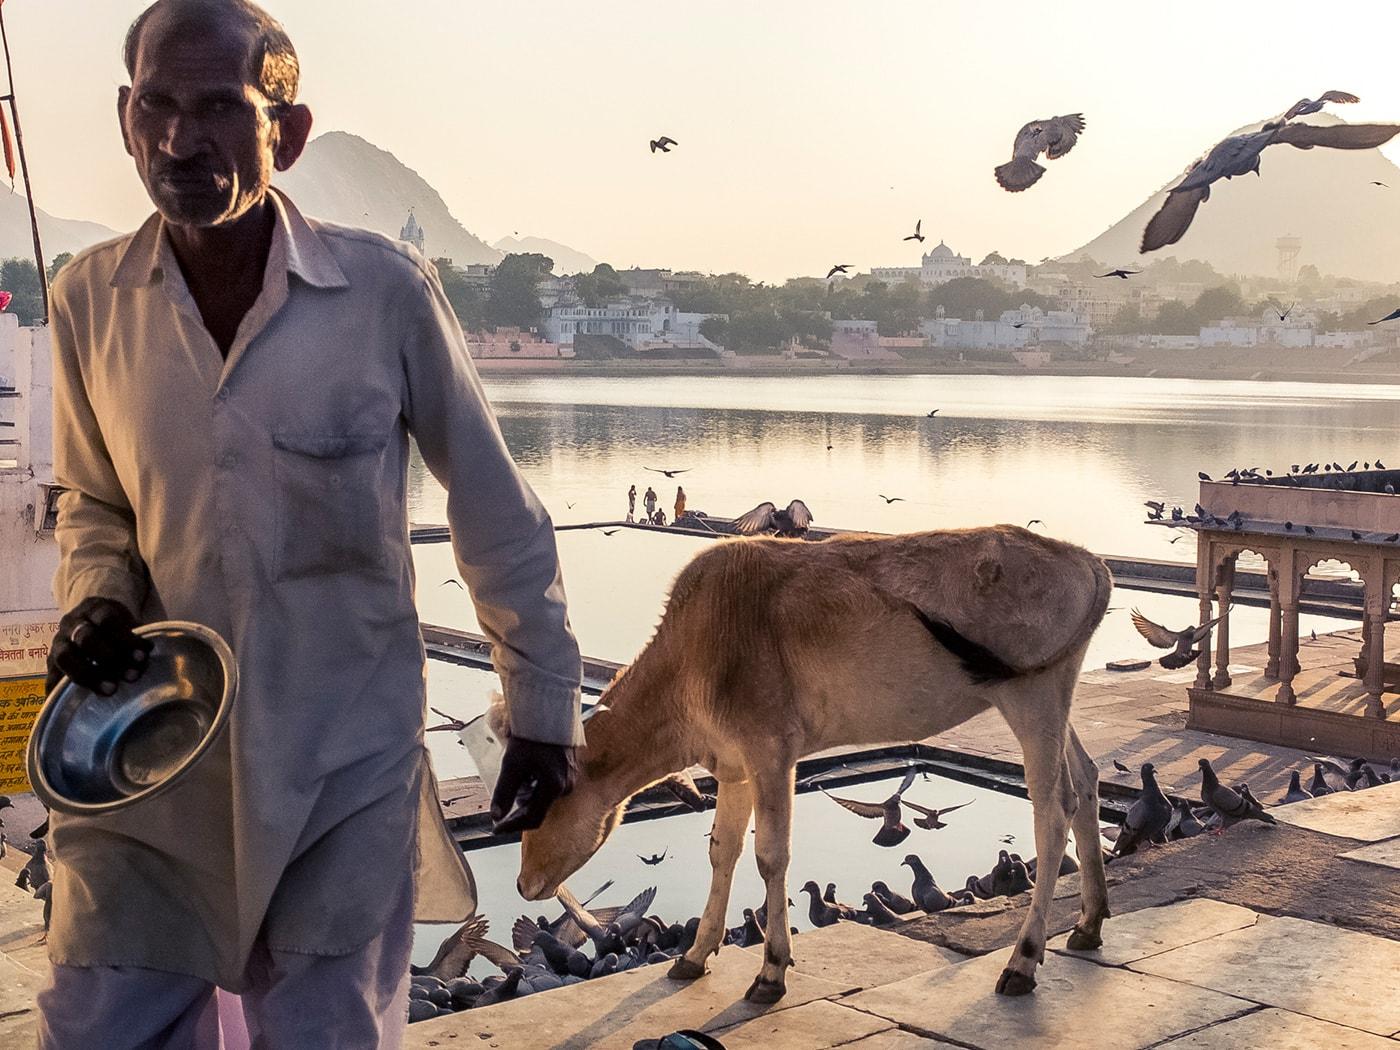 cultura indiana pushkar bramano